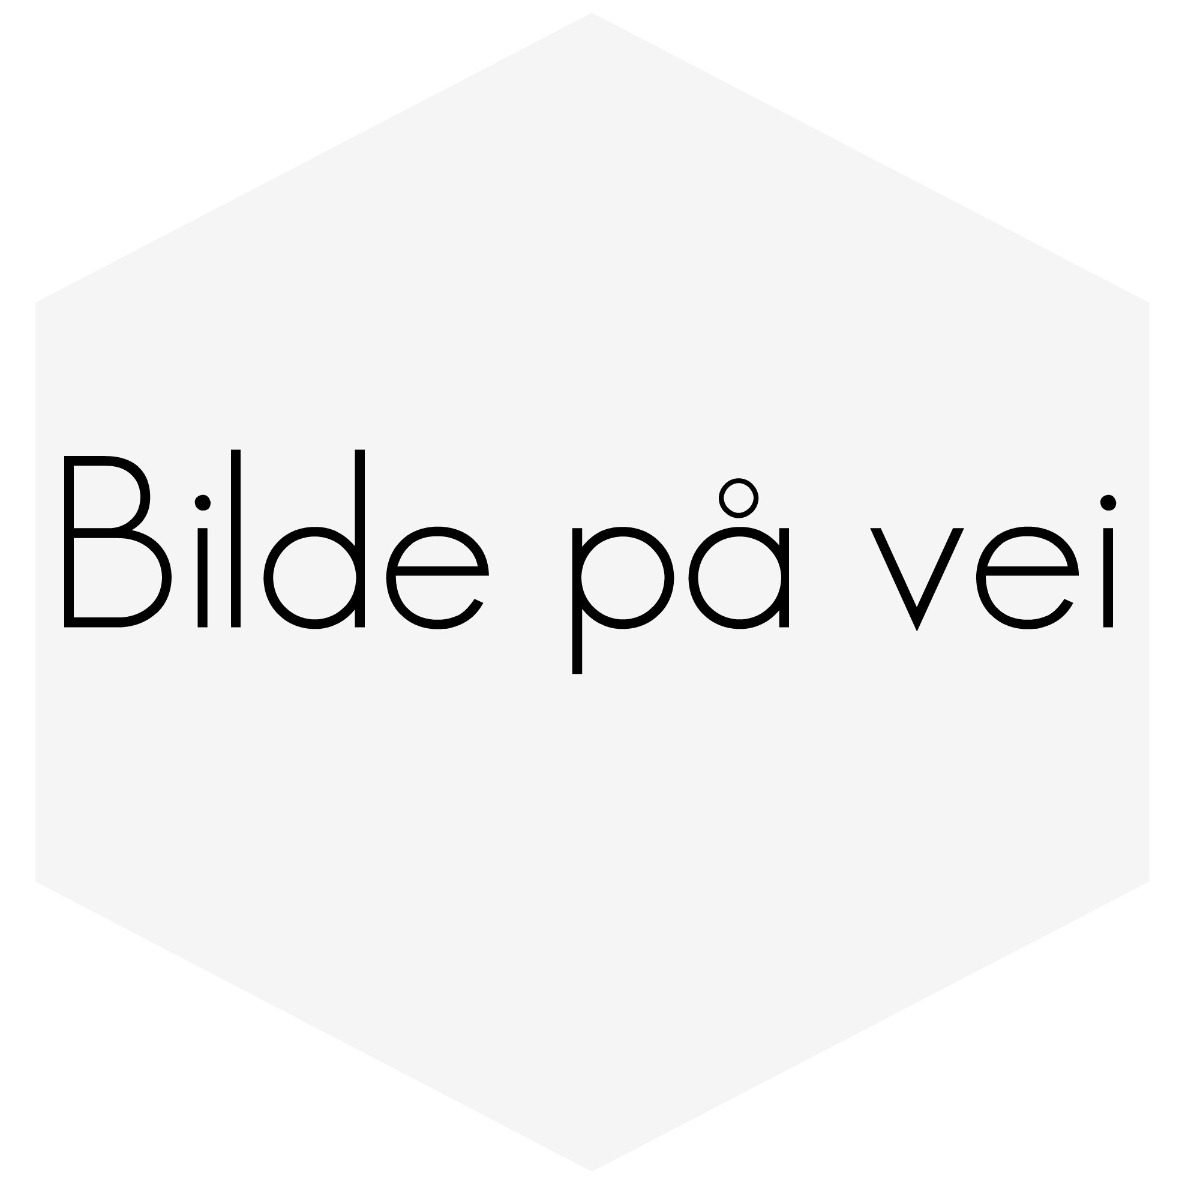 SILIKONSLANGE ARMERT BLÅ 0,75'' (19MM),pris pr meter